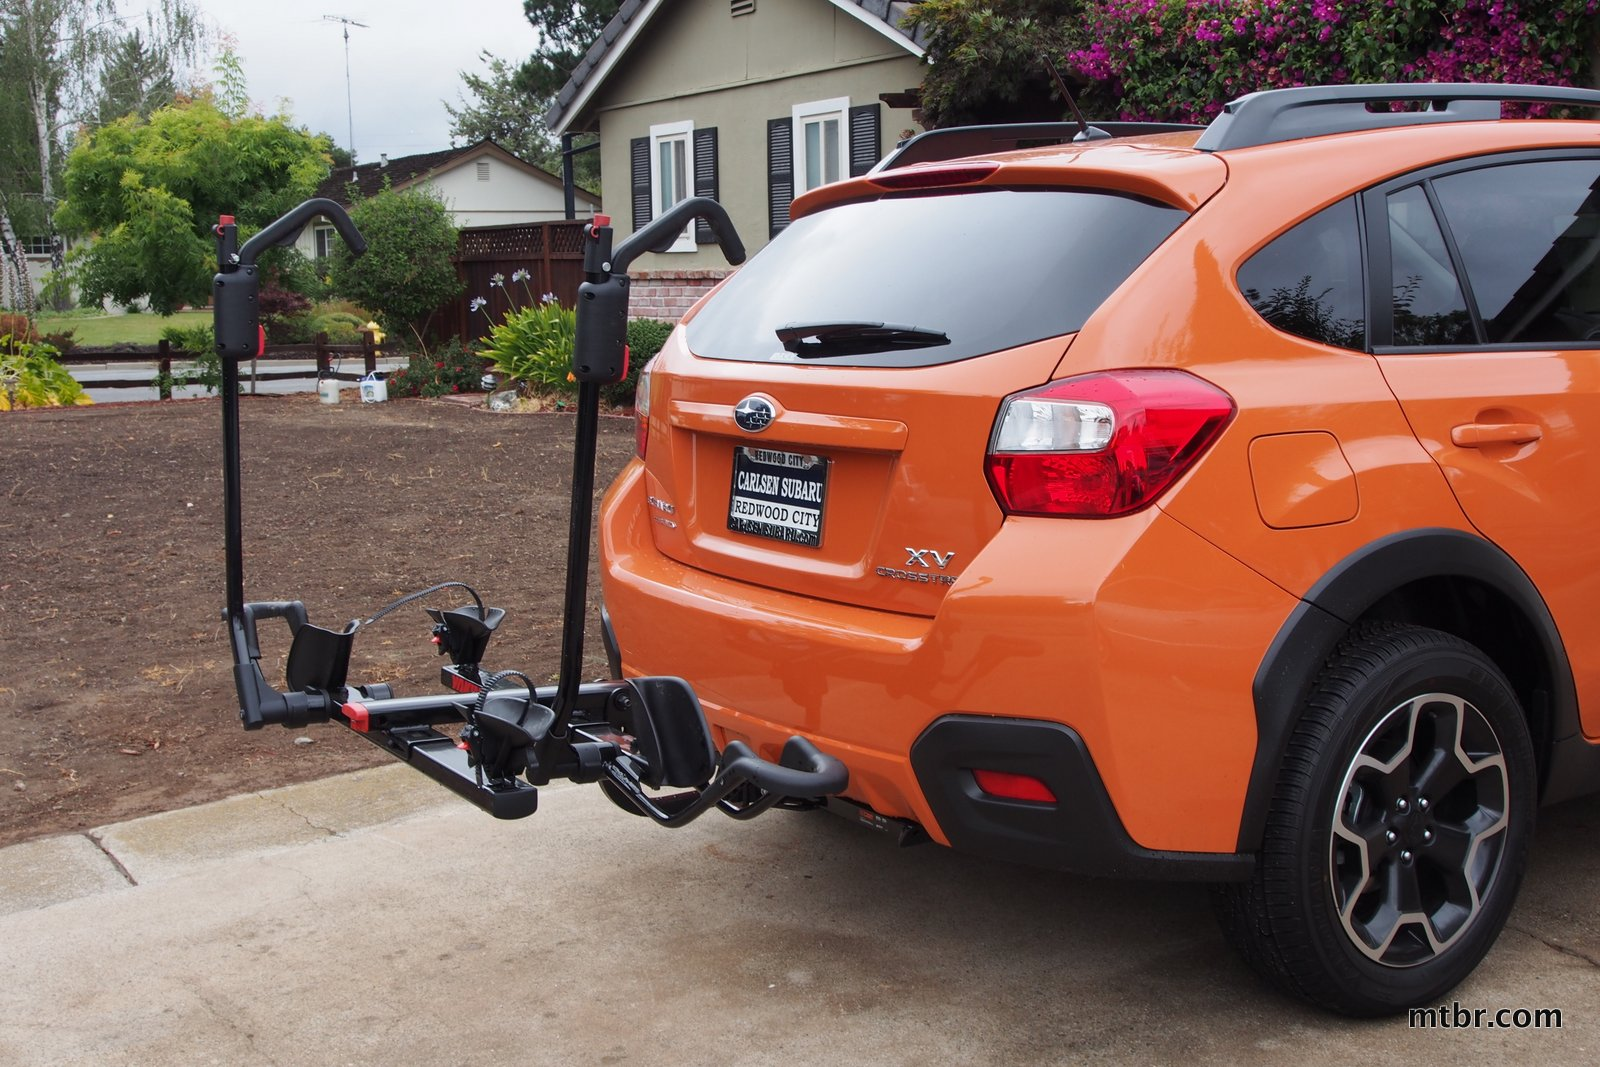 Yakima Hitch Rack On Subaru Mtbr Com